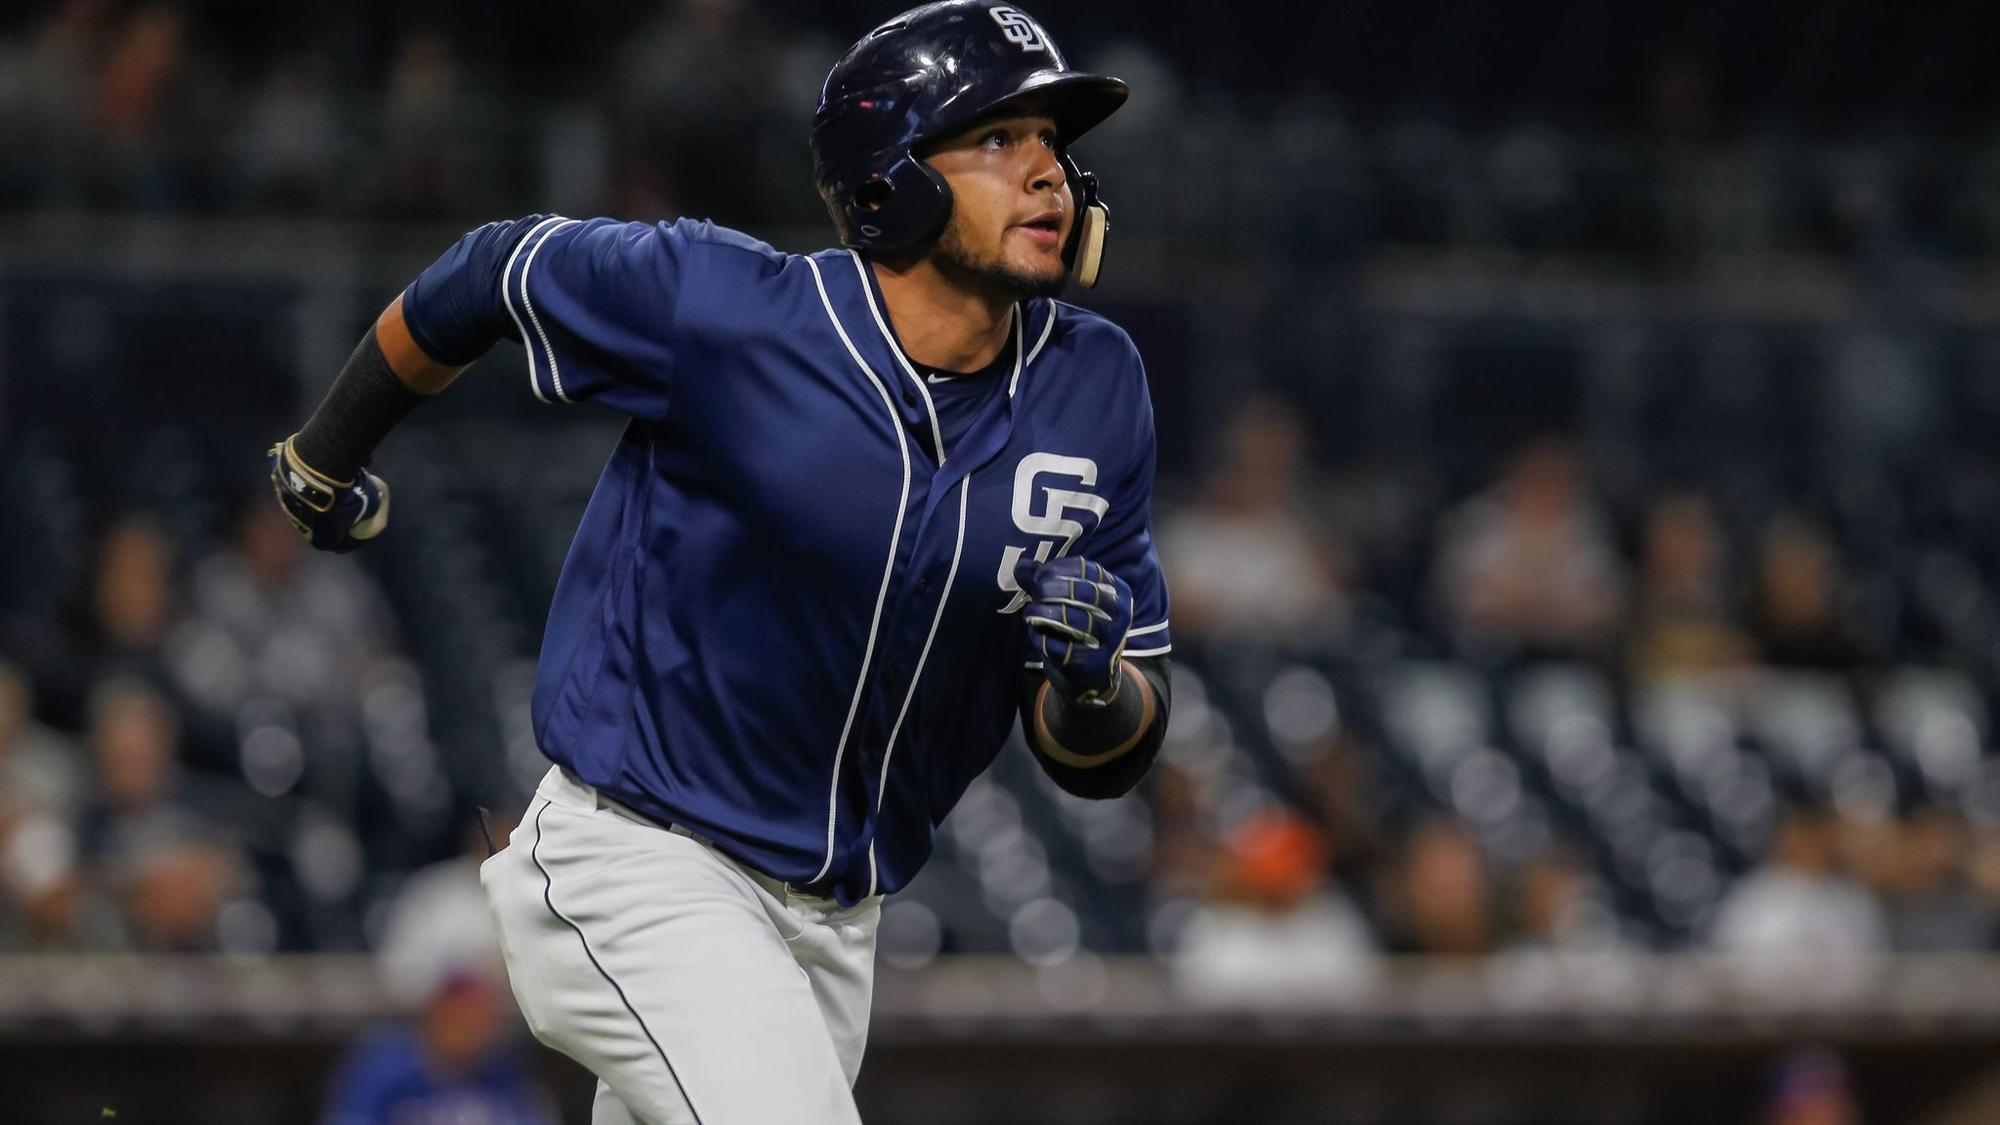 Sd-sp-padres-fernando-tatis-baseball-america-top-100-prospects-20180122